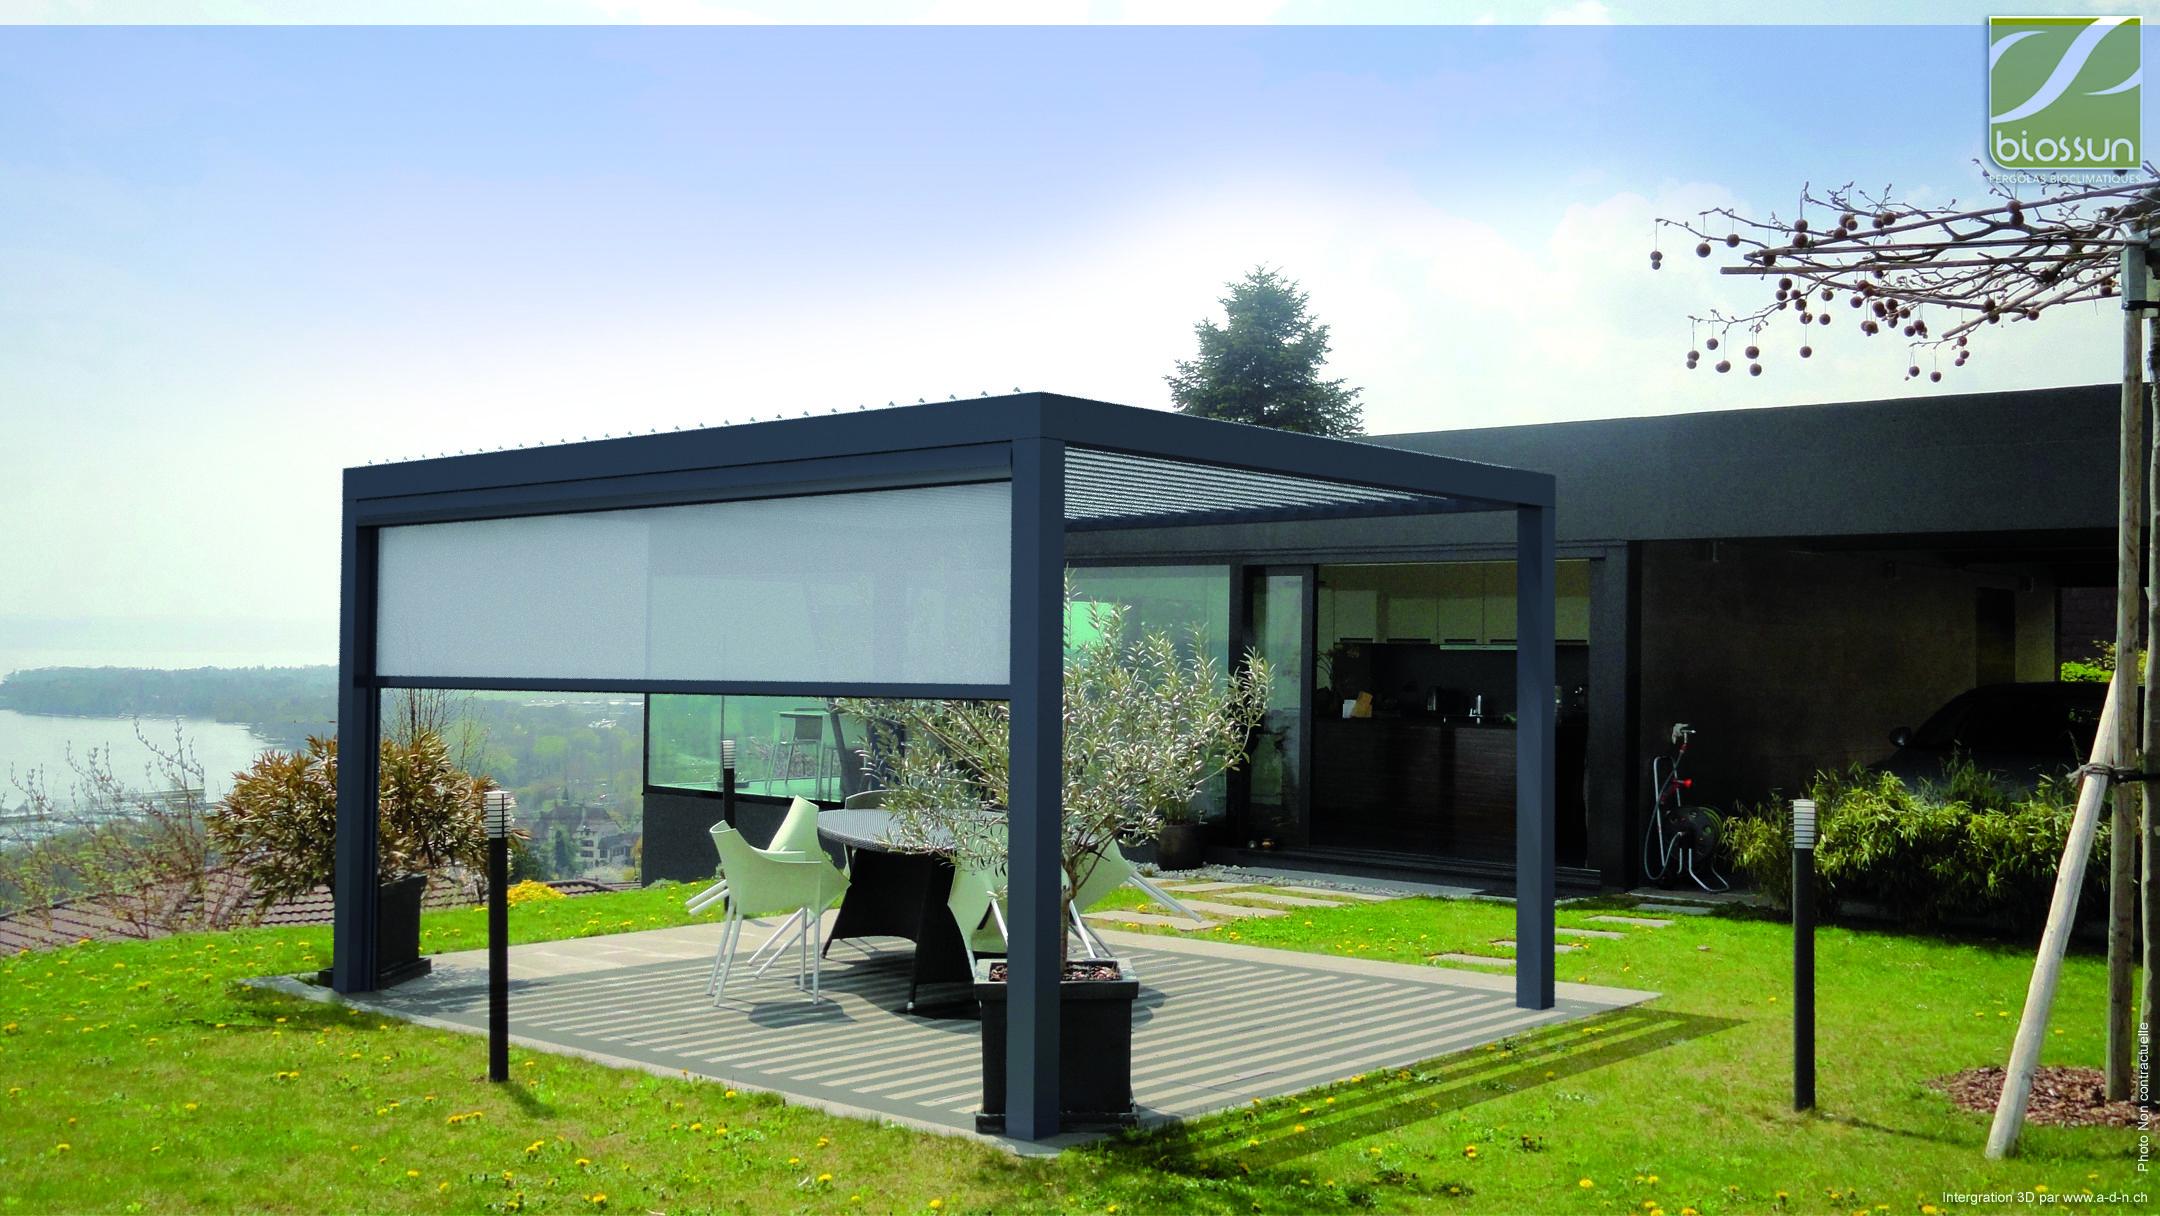 Biossun terrasoverkapping pergola couverture de terrasse ...